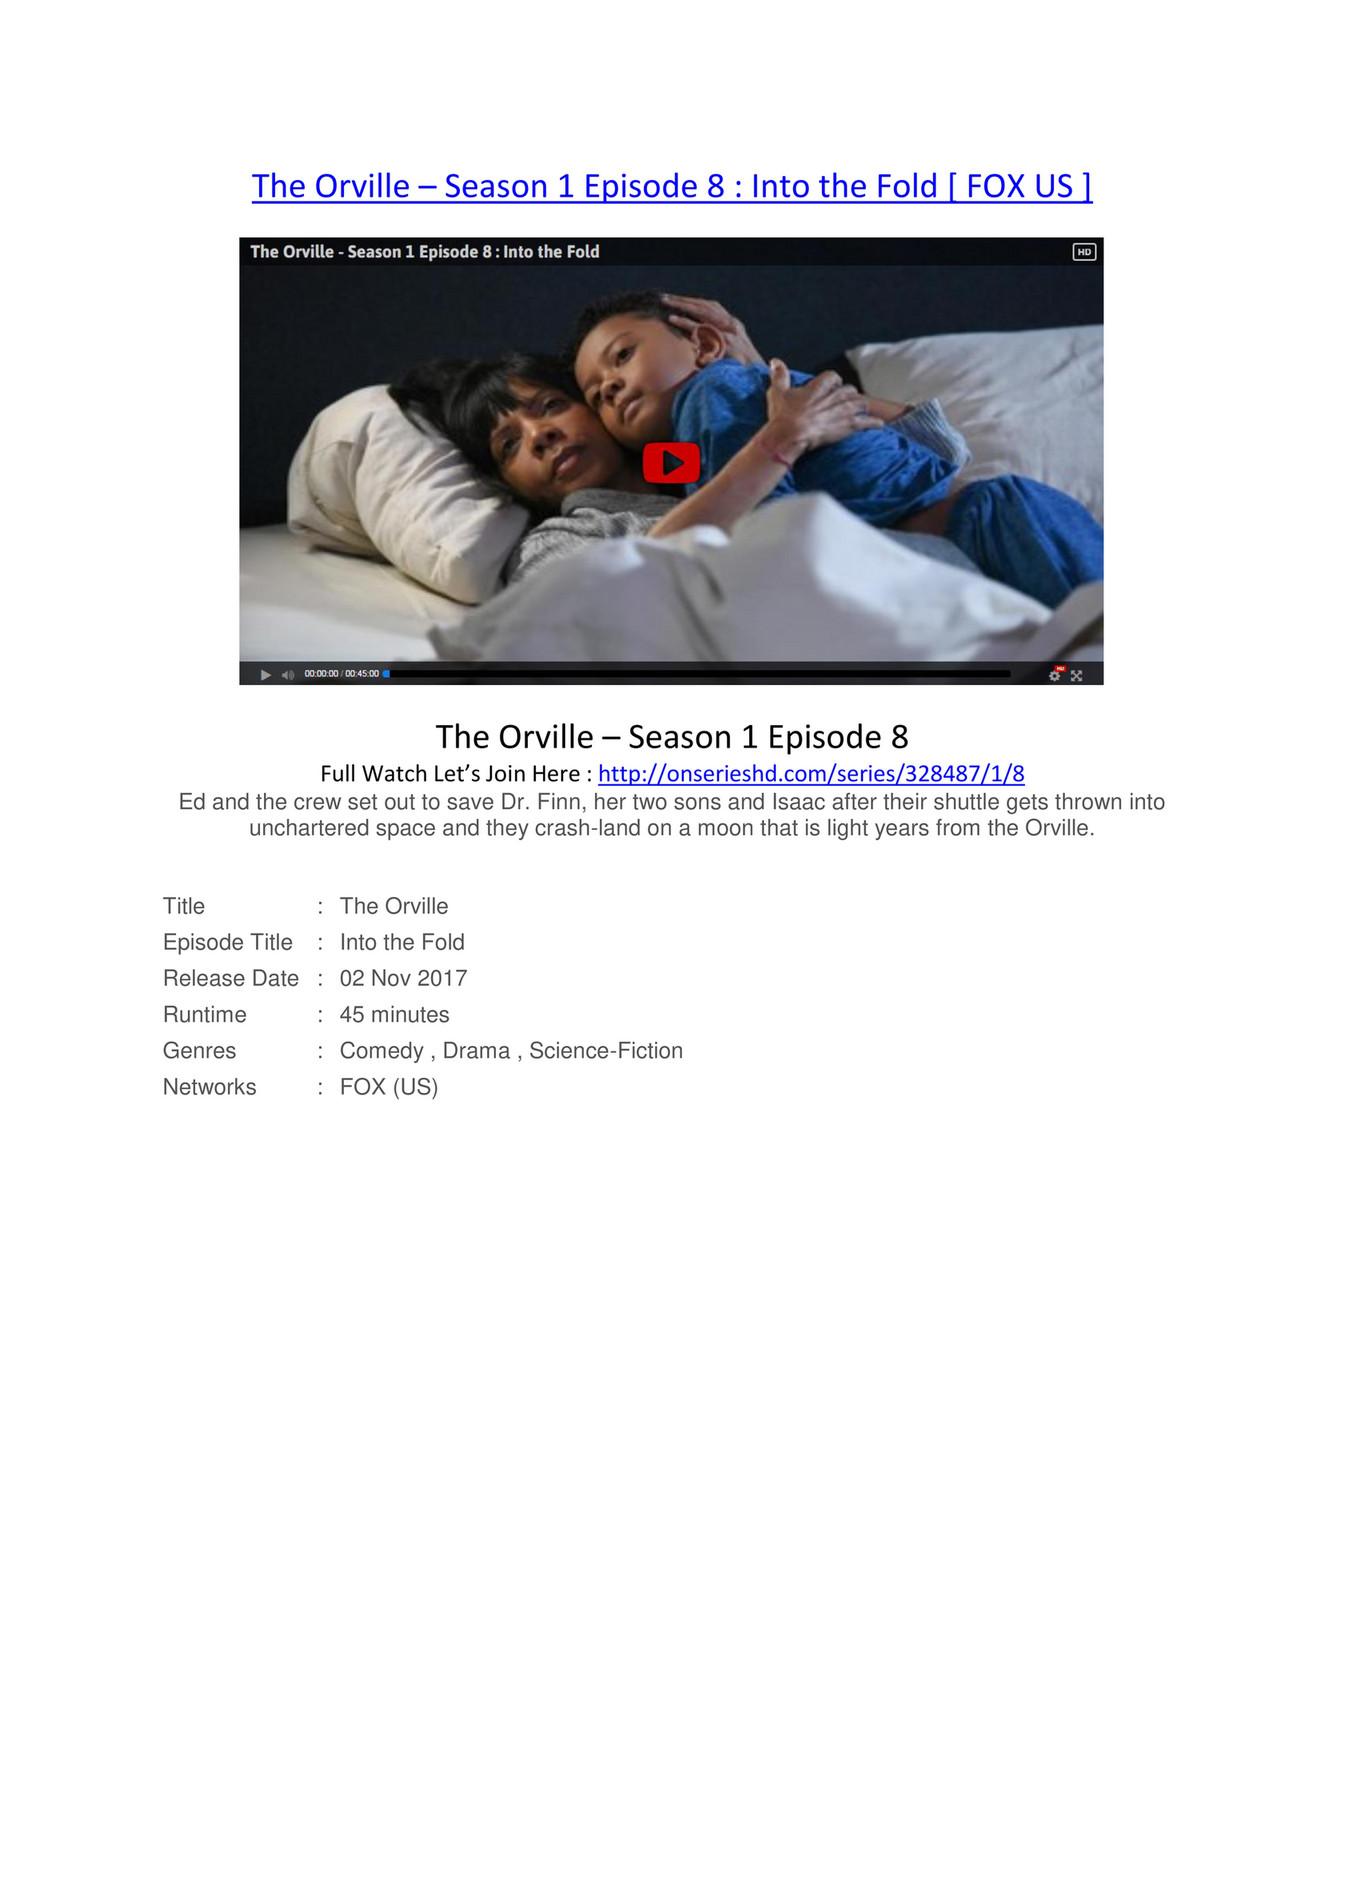 Full~Watch! The Orville (s01xe08) – Season 1 Episode 8 [CBS